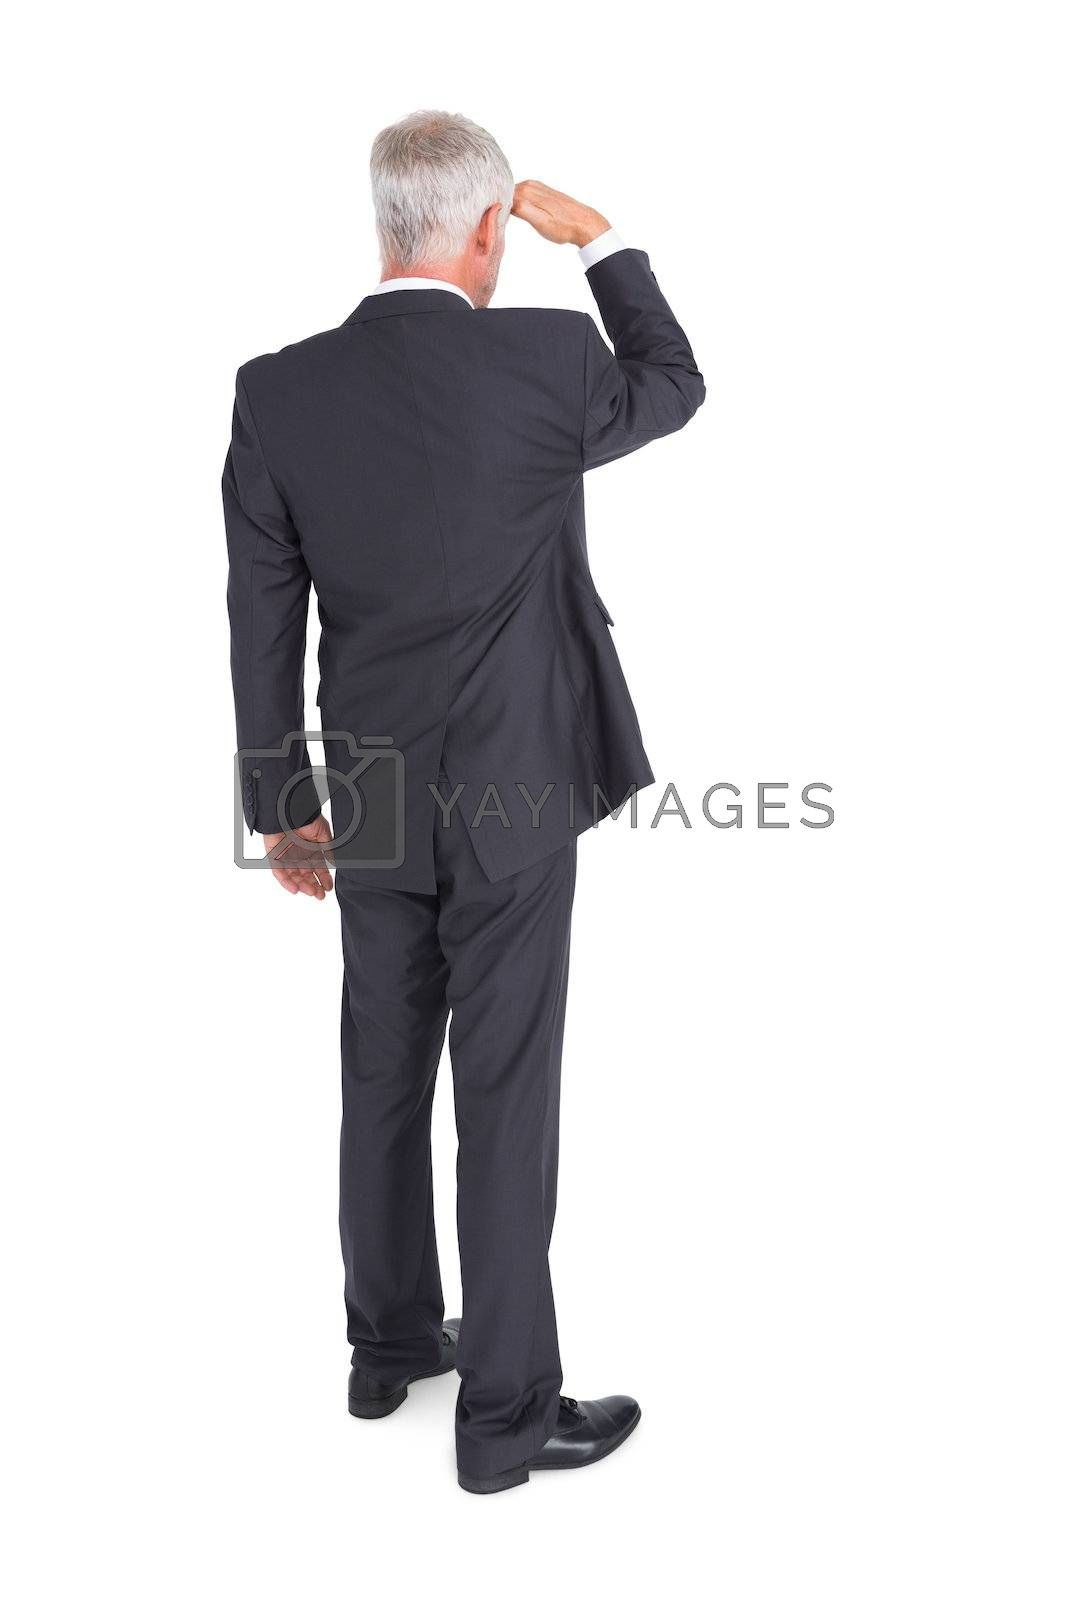 Rear view of mature businessman looking away by Wavebreakmedia